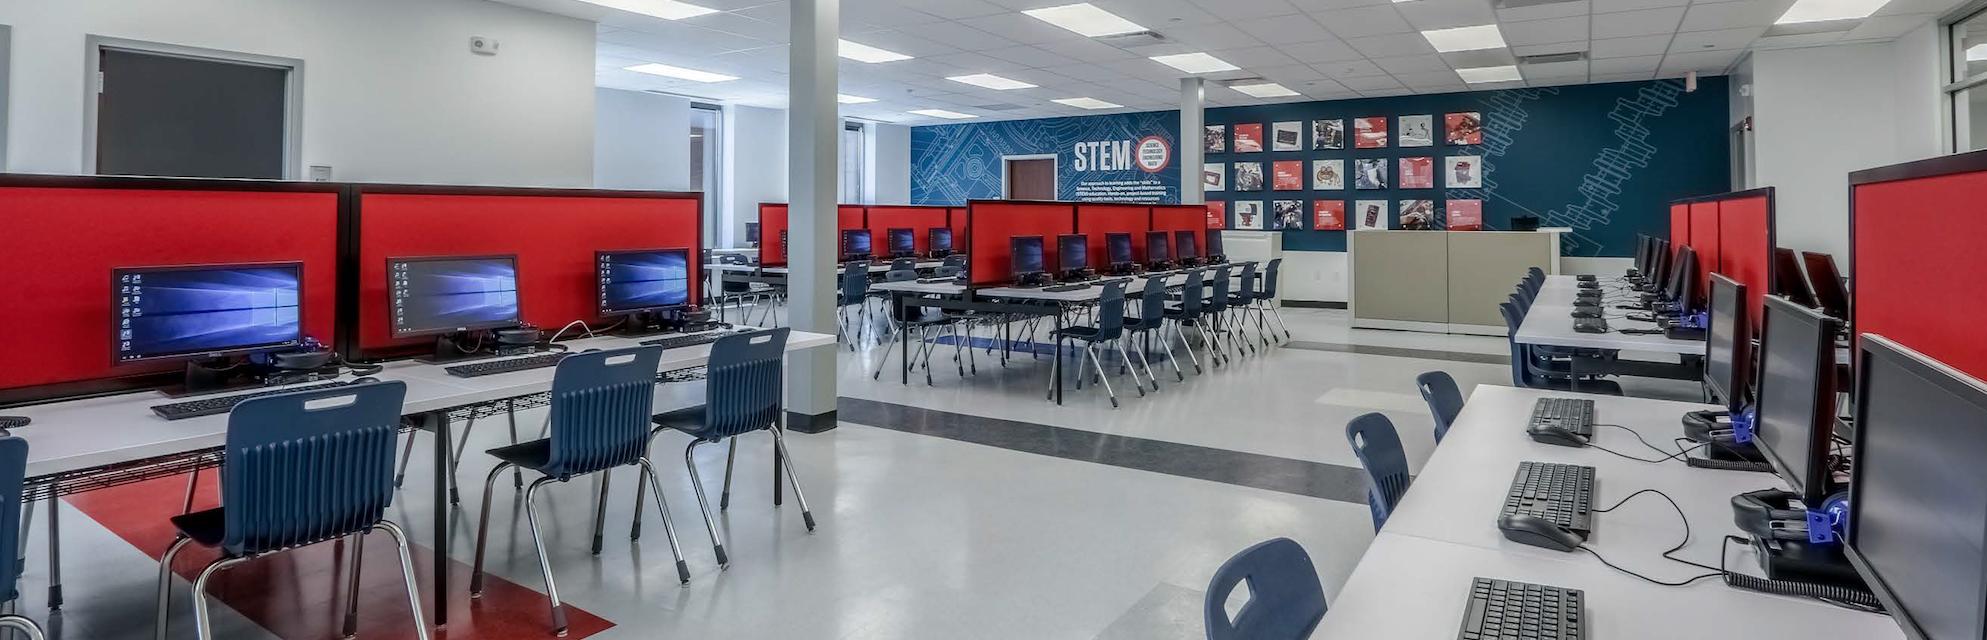 UTI STEM classroom